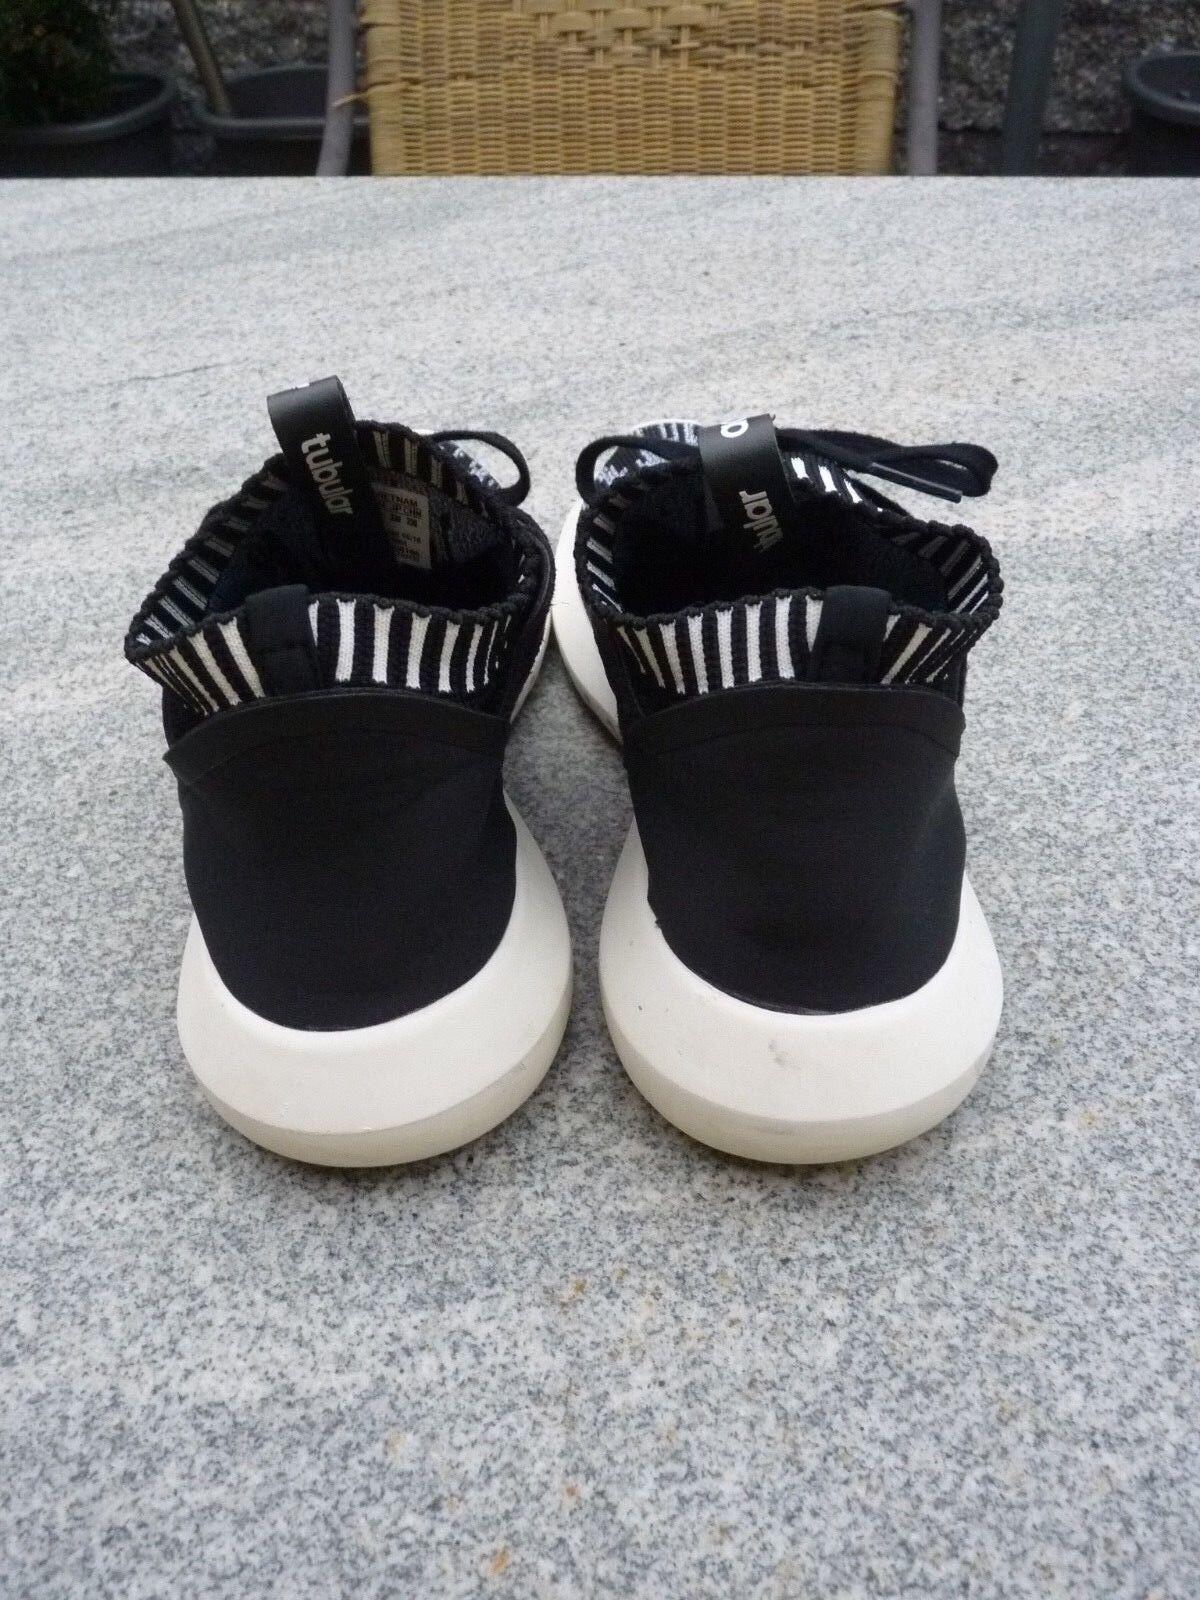 Adidas tubuläre trotzig trotzig trotzig primeknit schwarz wei ß g 37 1 / 3 uns 6 a4fd2a